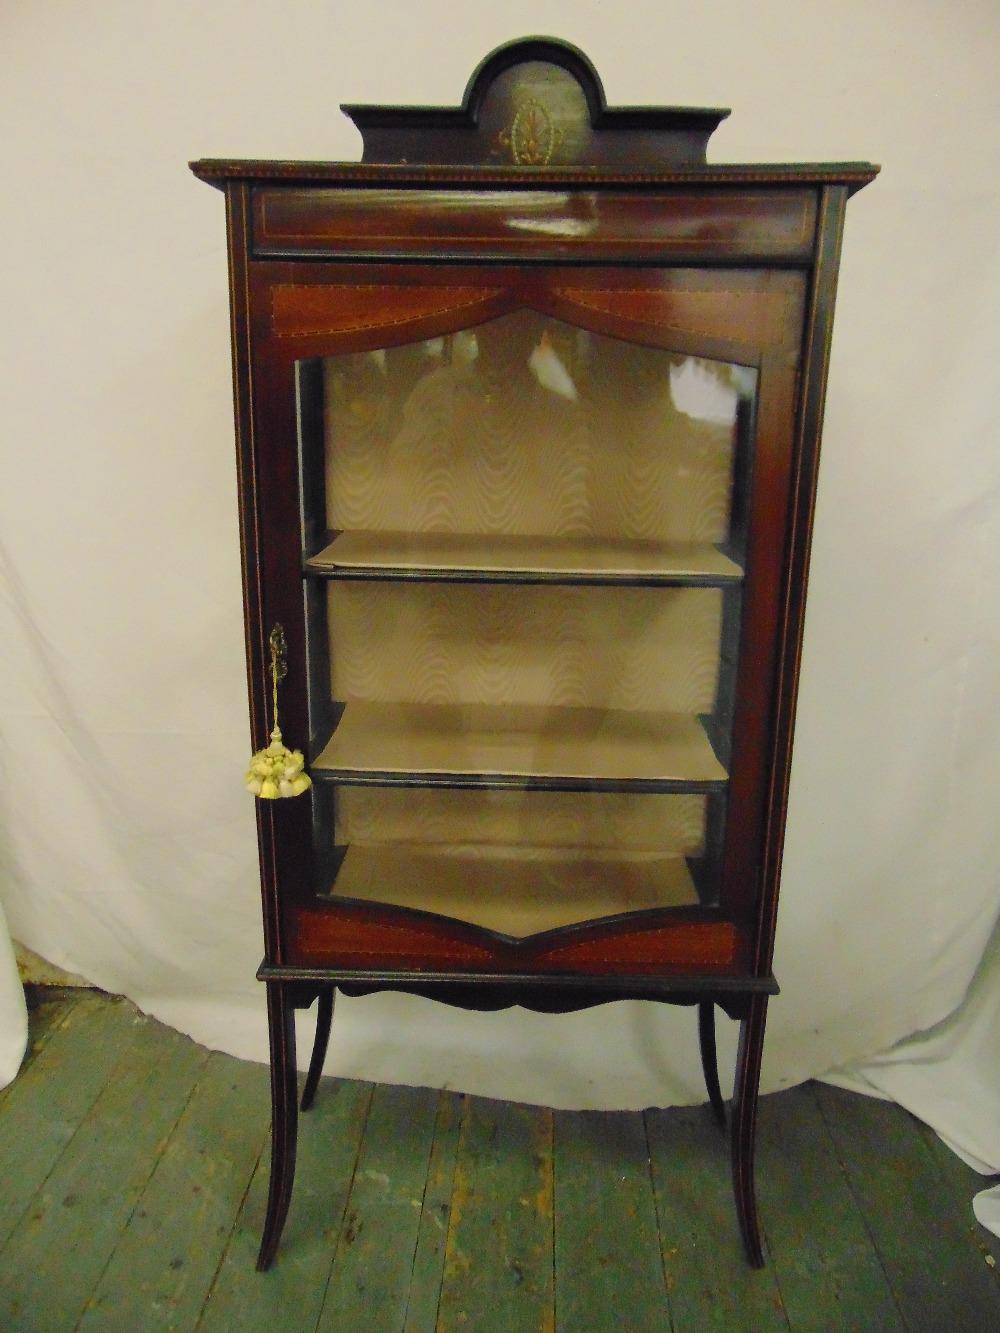 Lot 17 - An Edwardian rectangular mahogany glazed display cabinet on four outswept legs